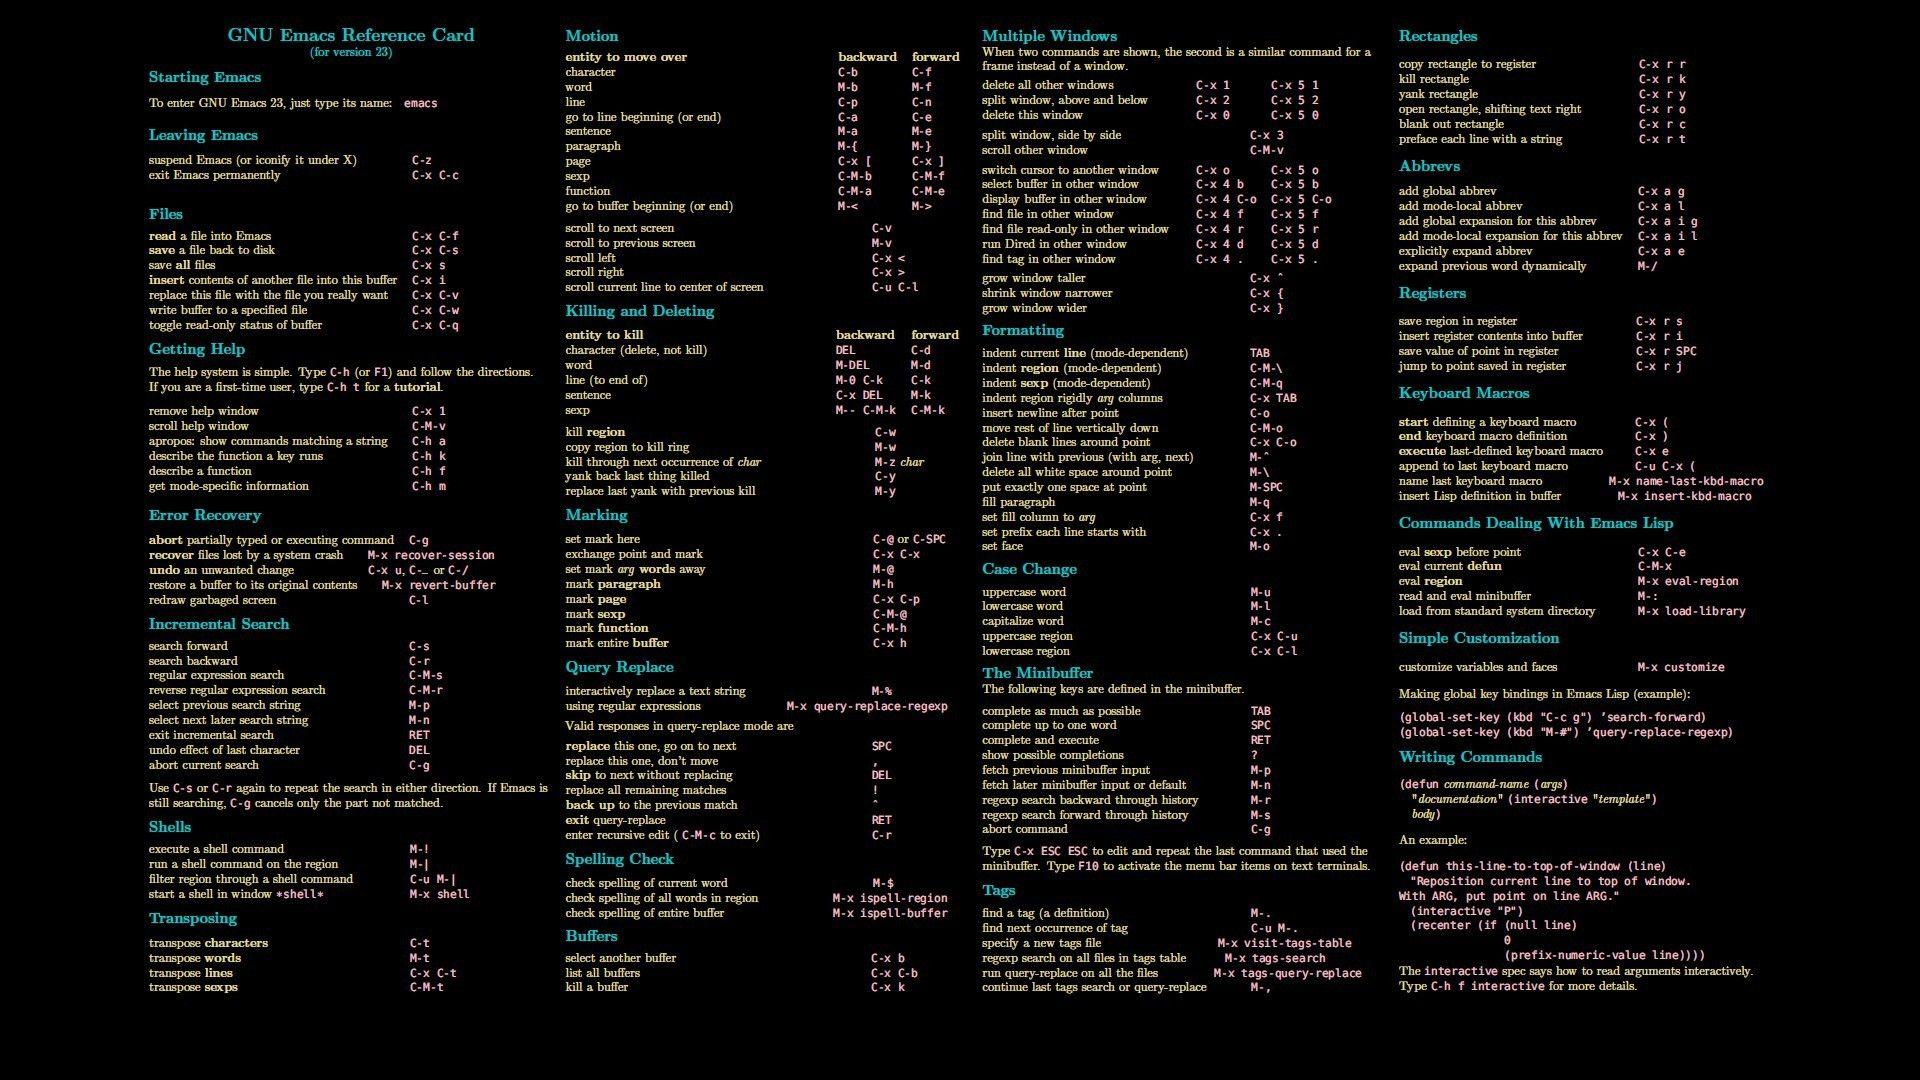 Gnulinux lisp charts cheatsheet elisp (1920x1080, charts) via www